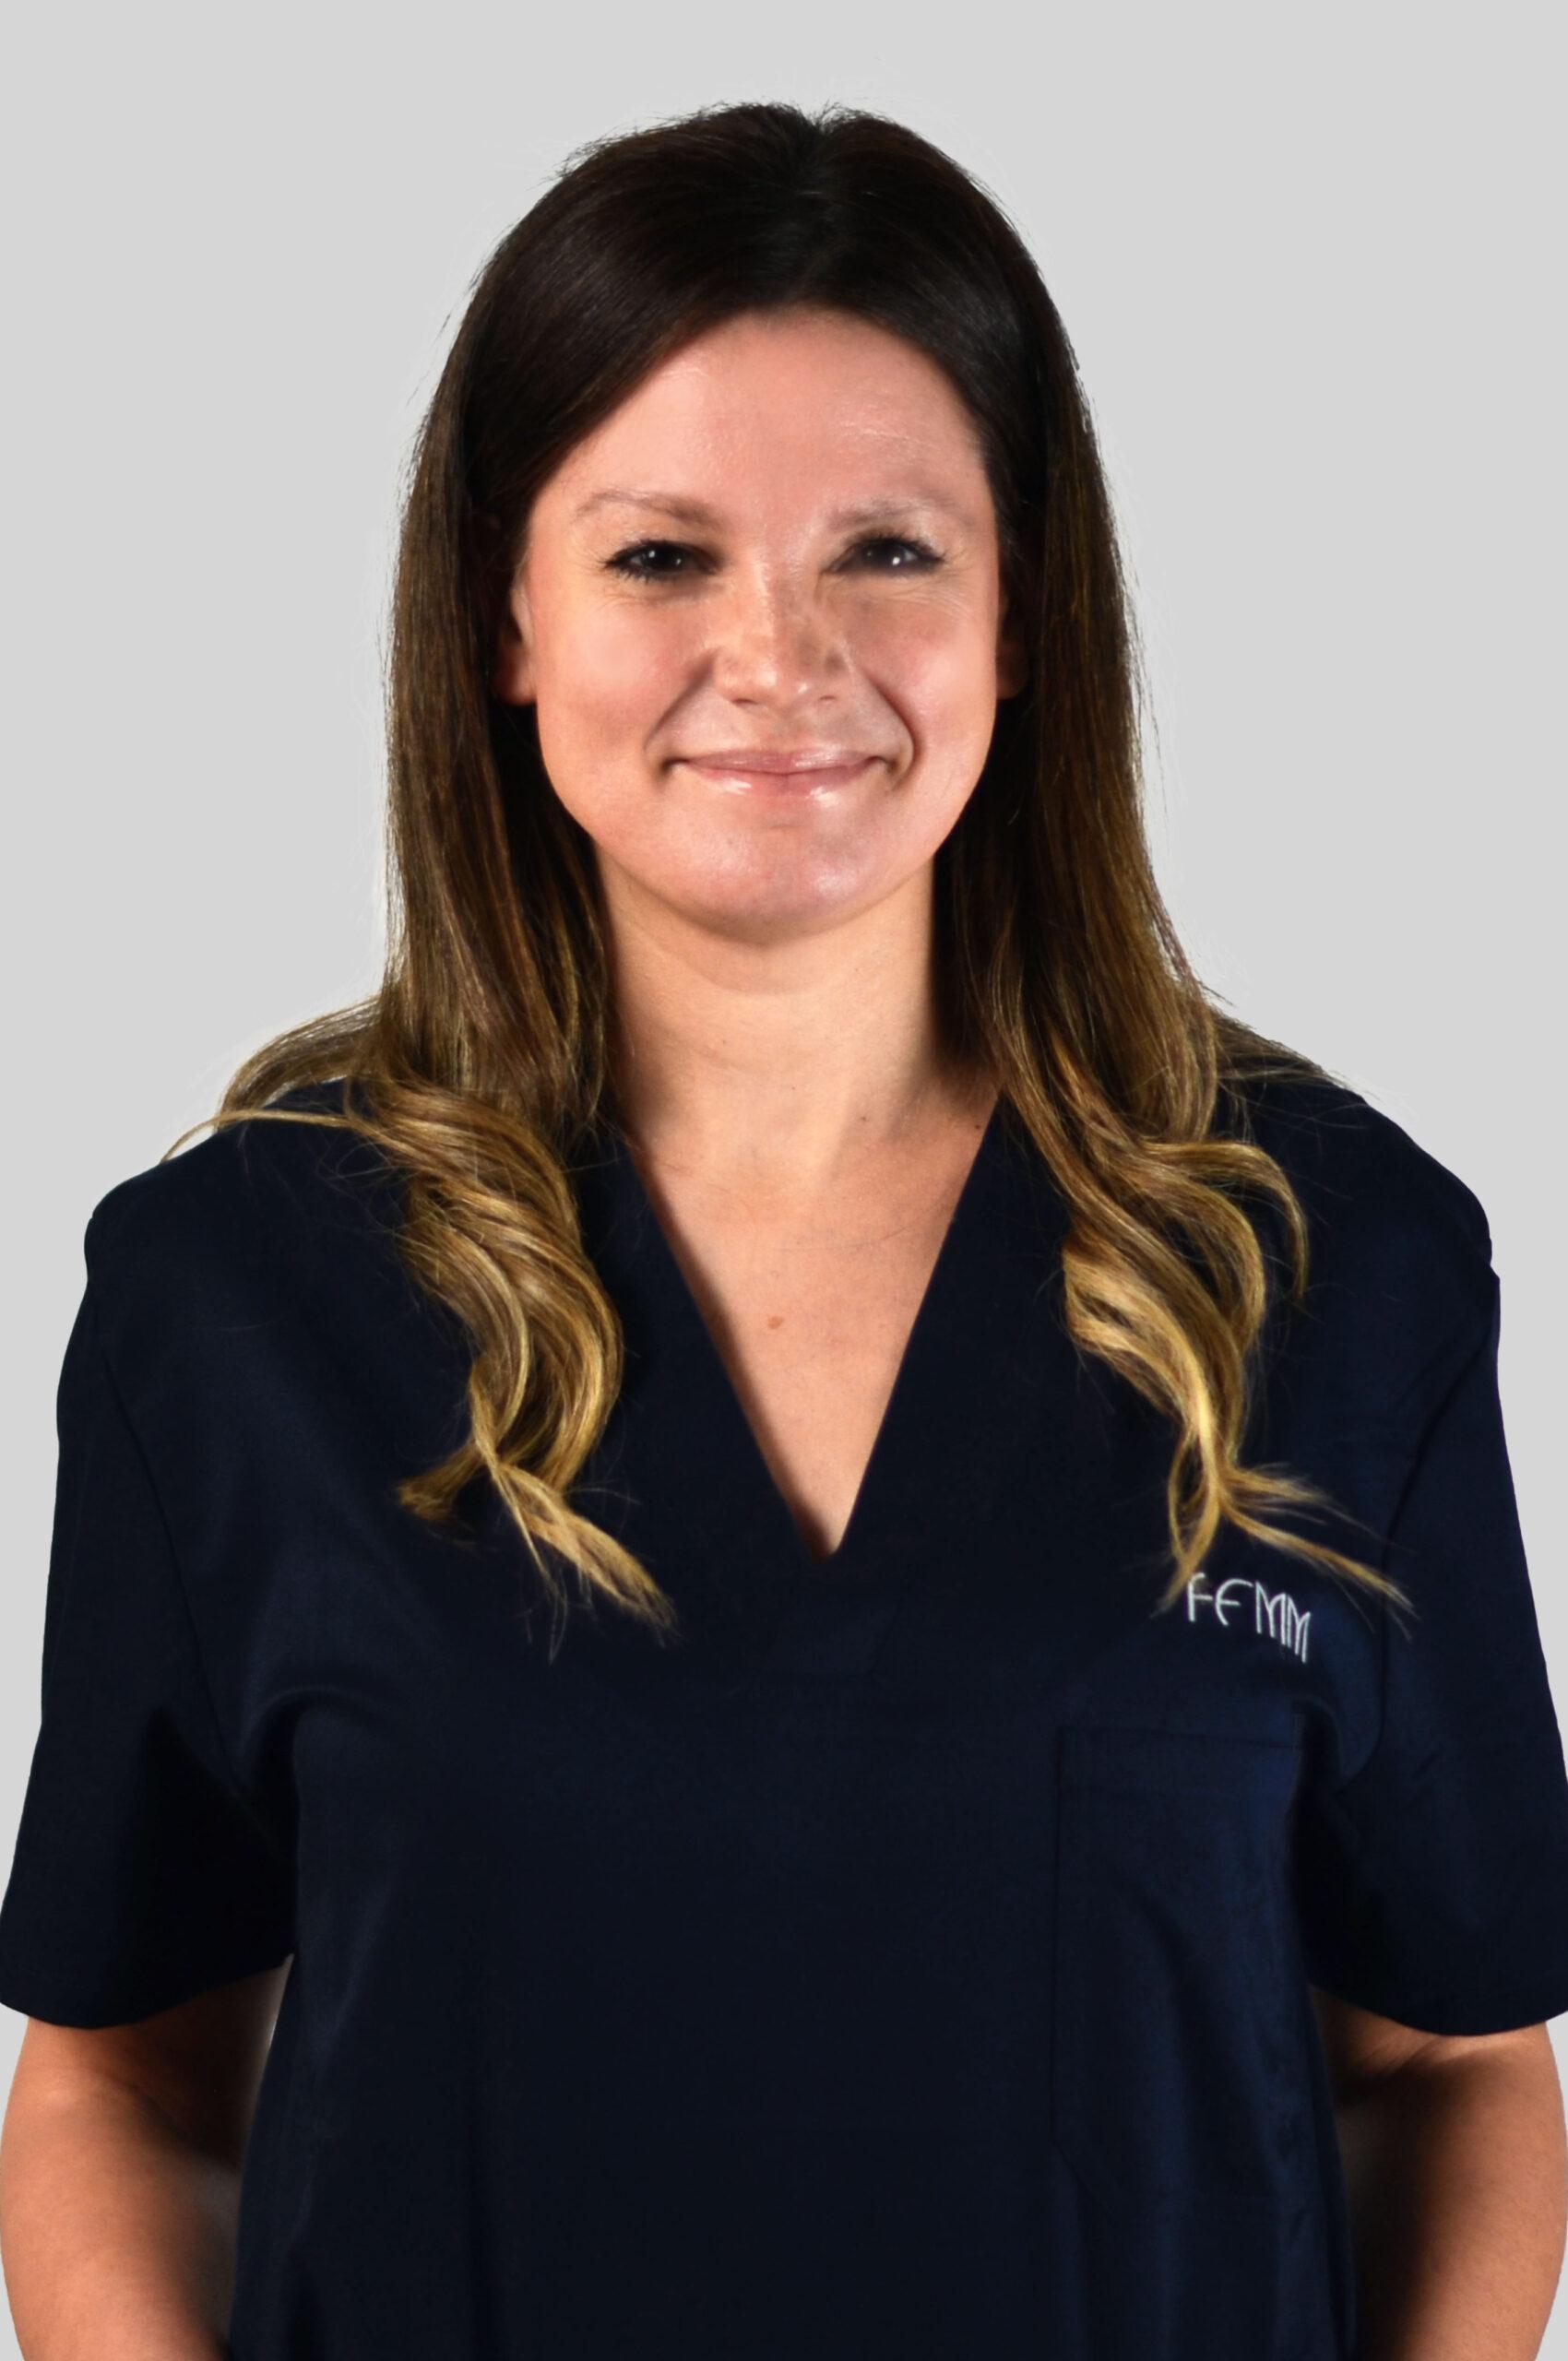 Carolina Pérez Osuna